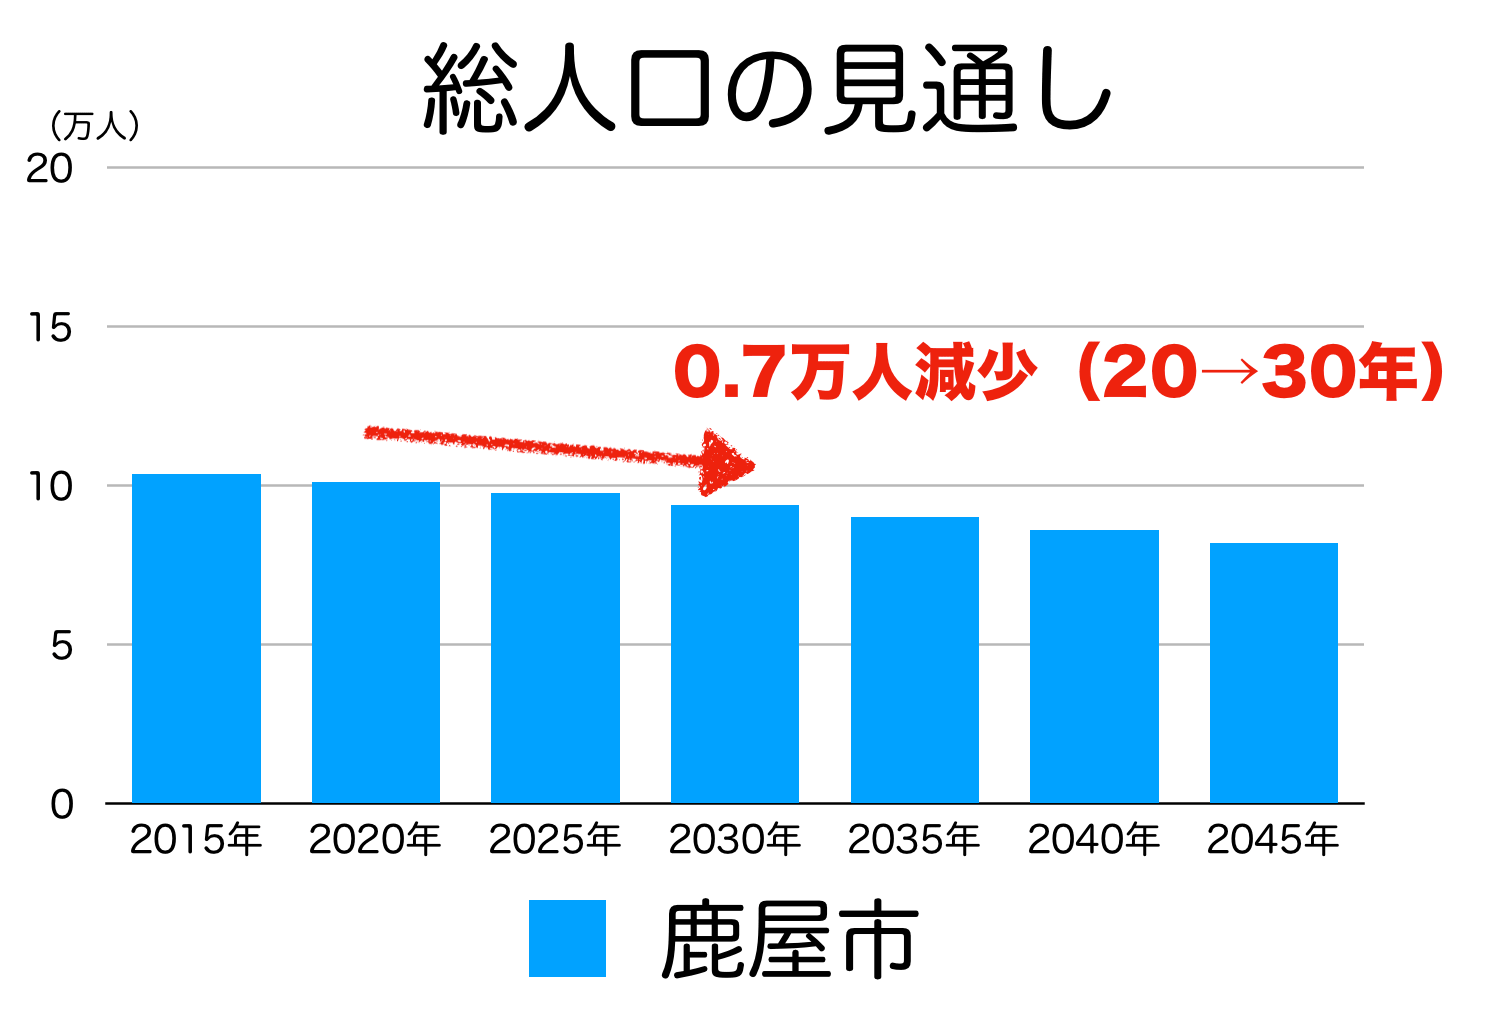 鹿屋市の人口予測